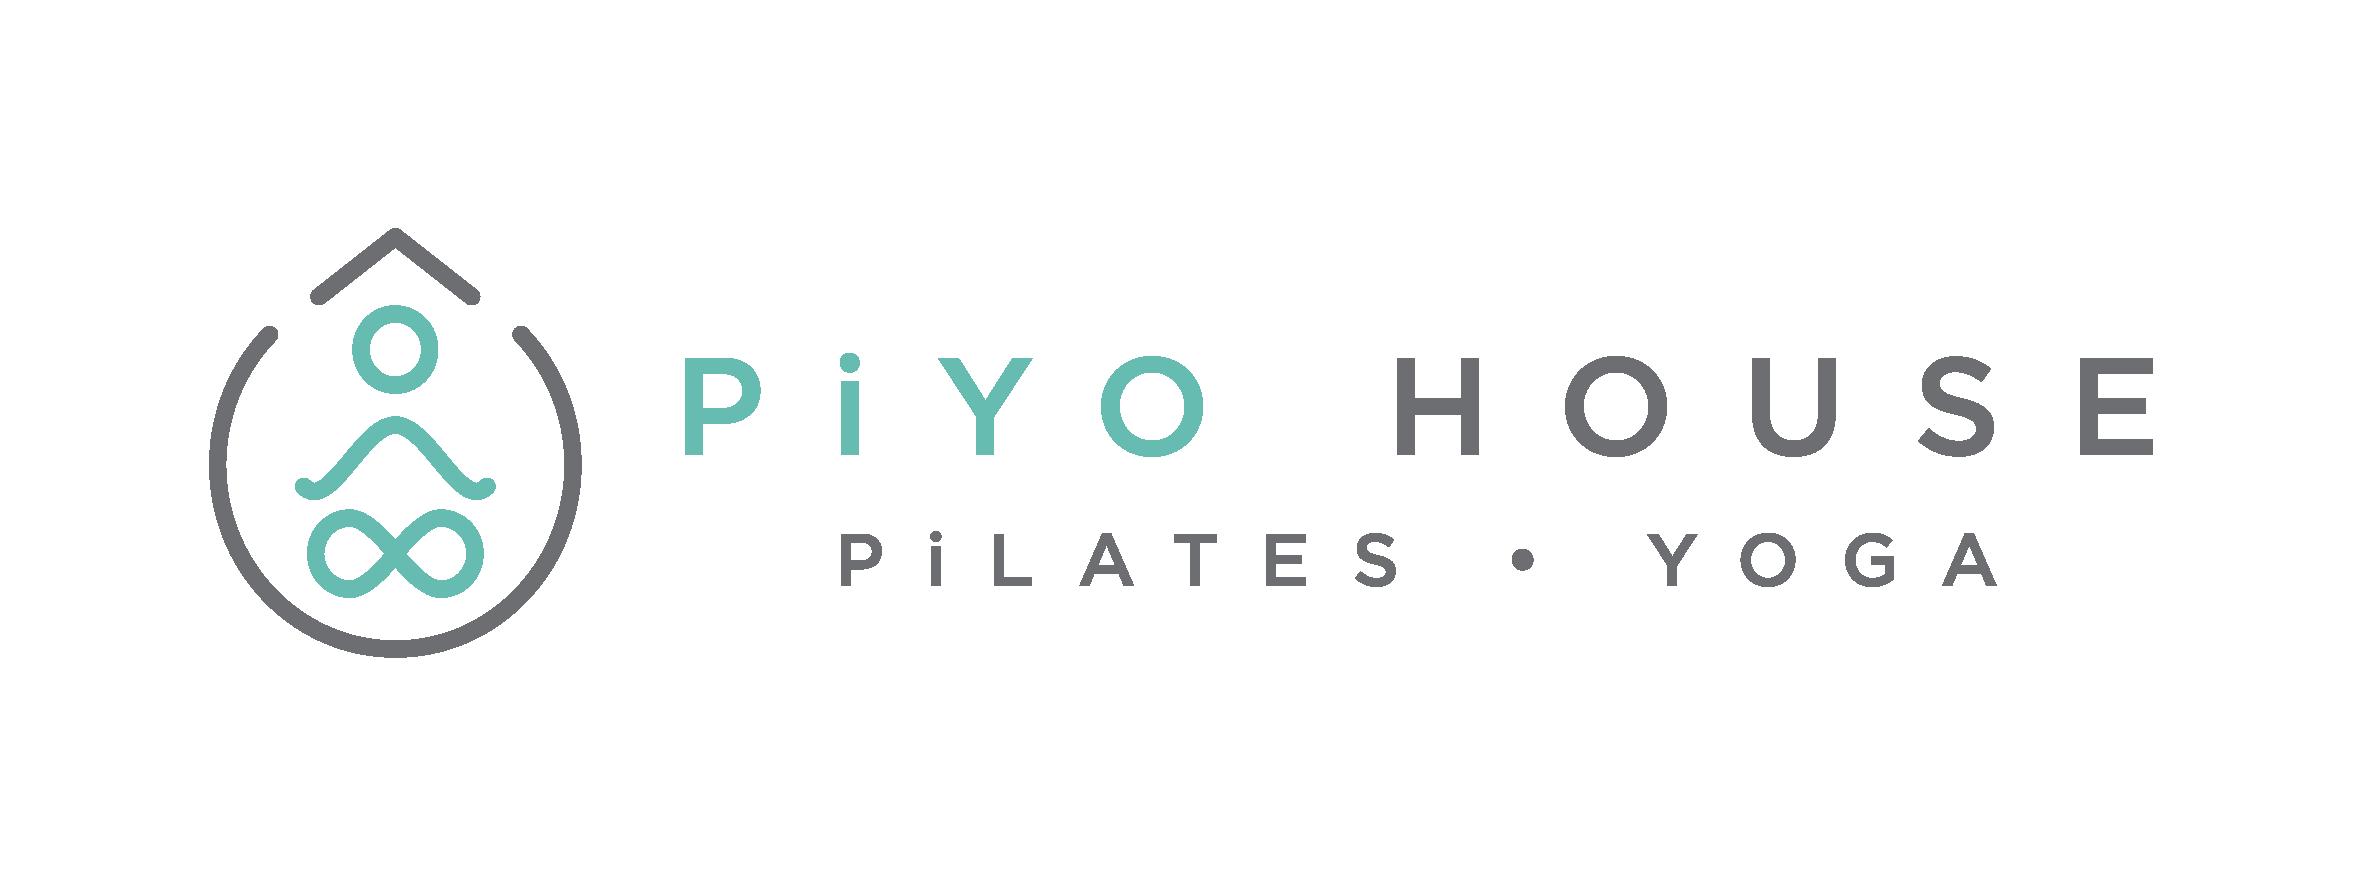 piyo house logosu